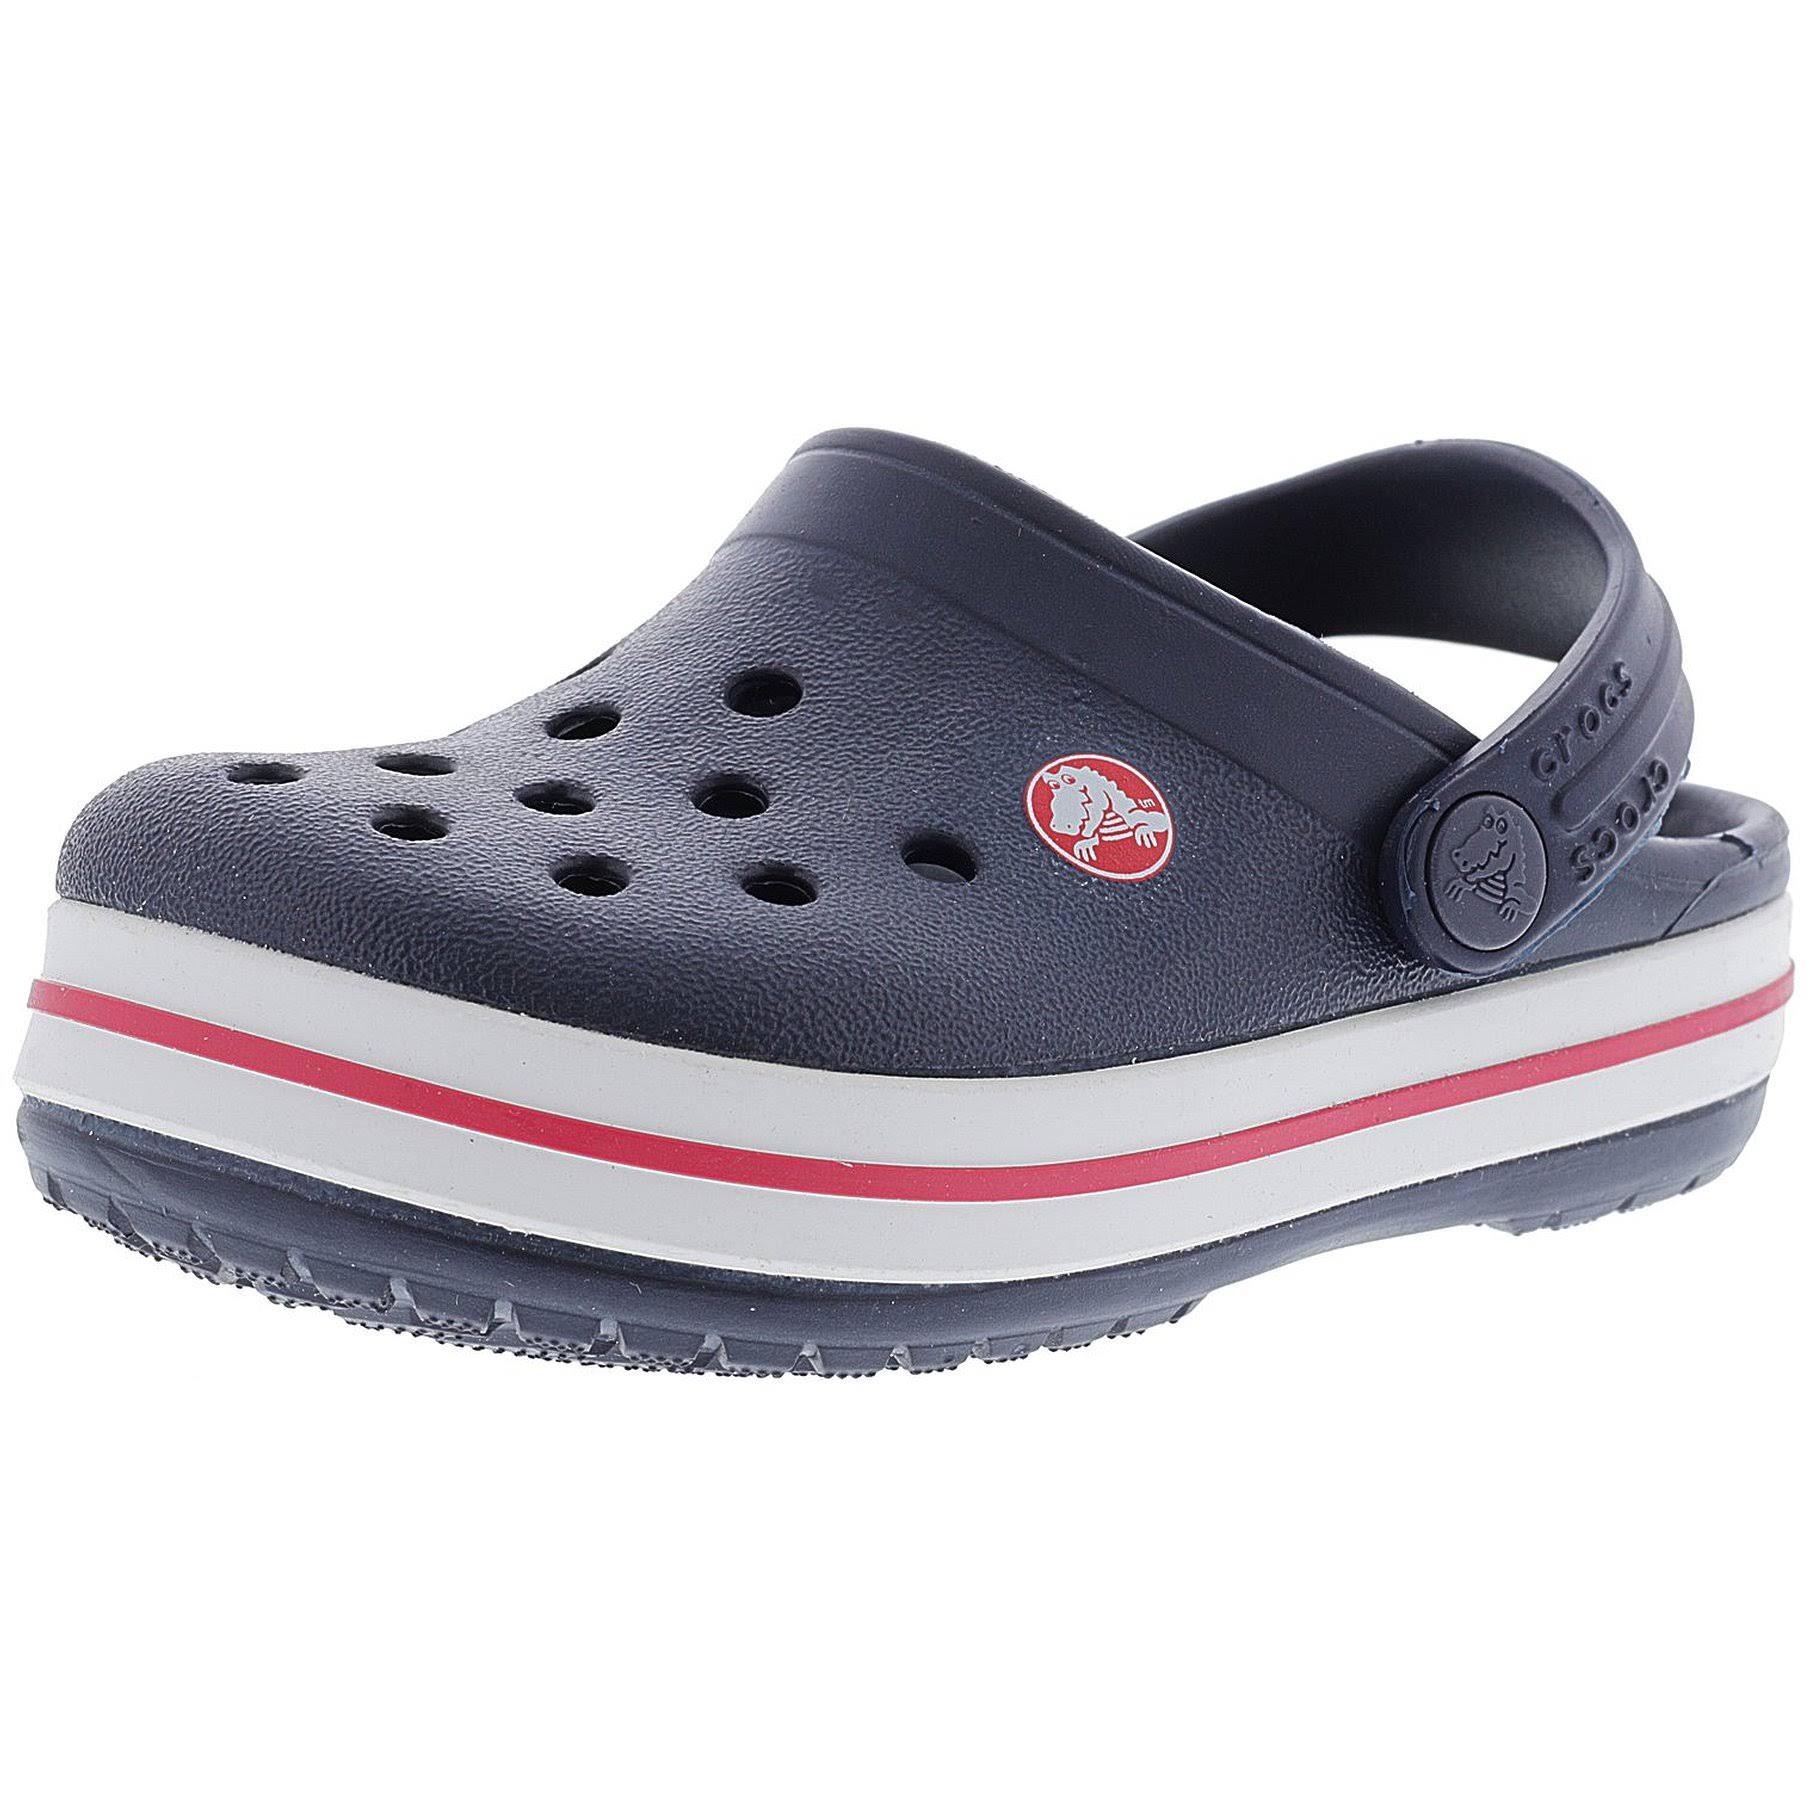 Crocs Kids Marineblau Rot Clogs Ltd Clog 5m Crocband URcHFrU